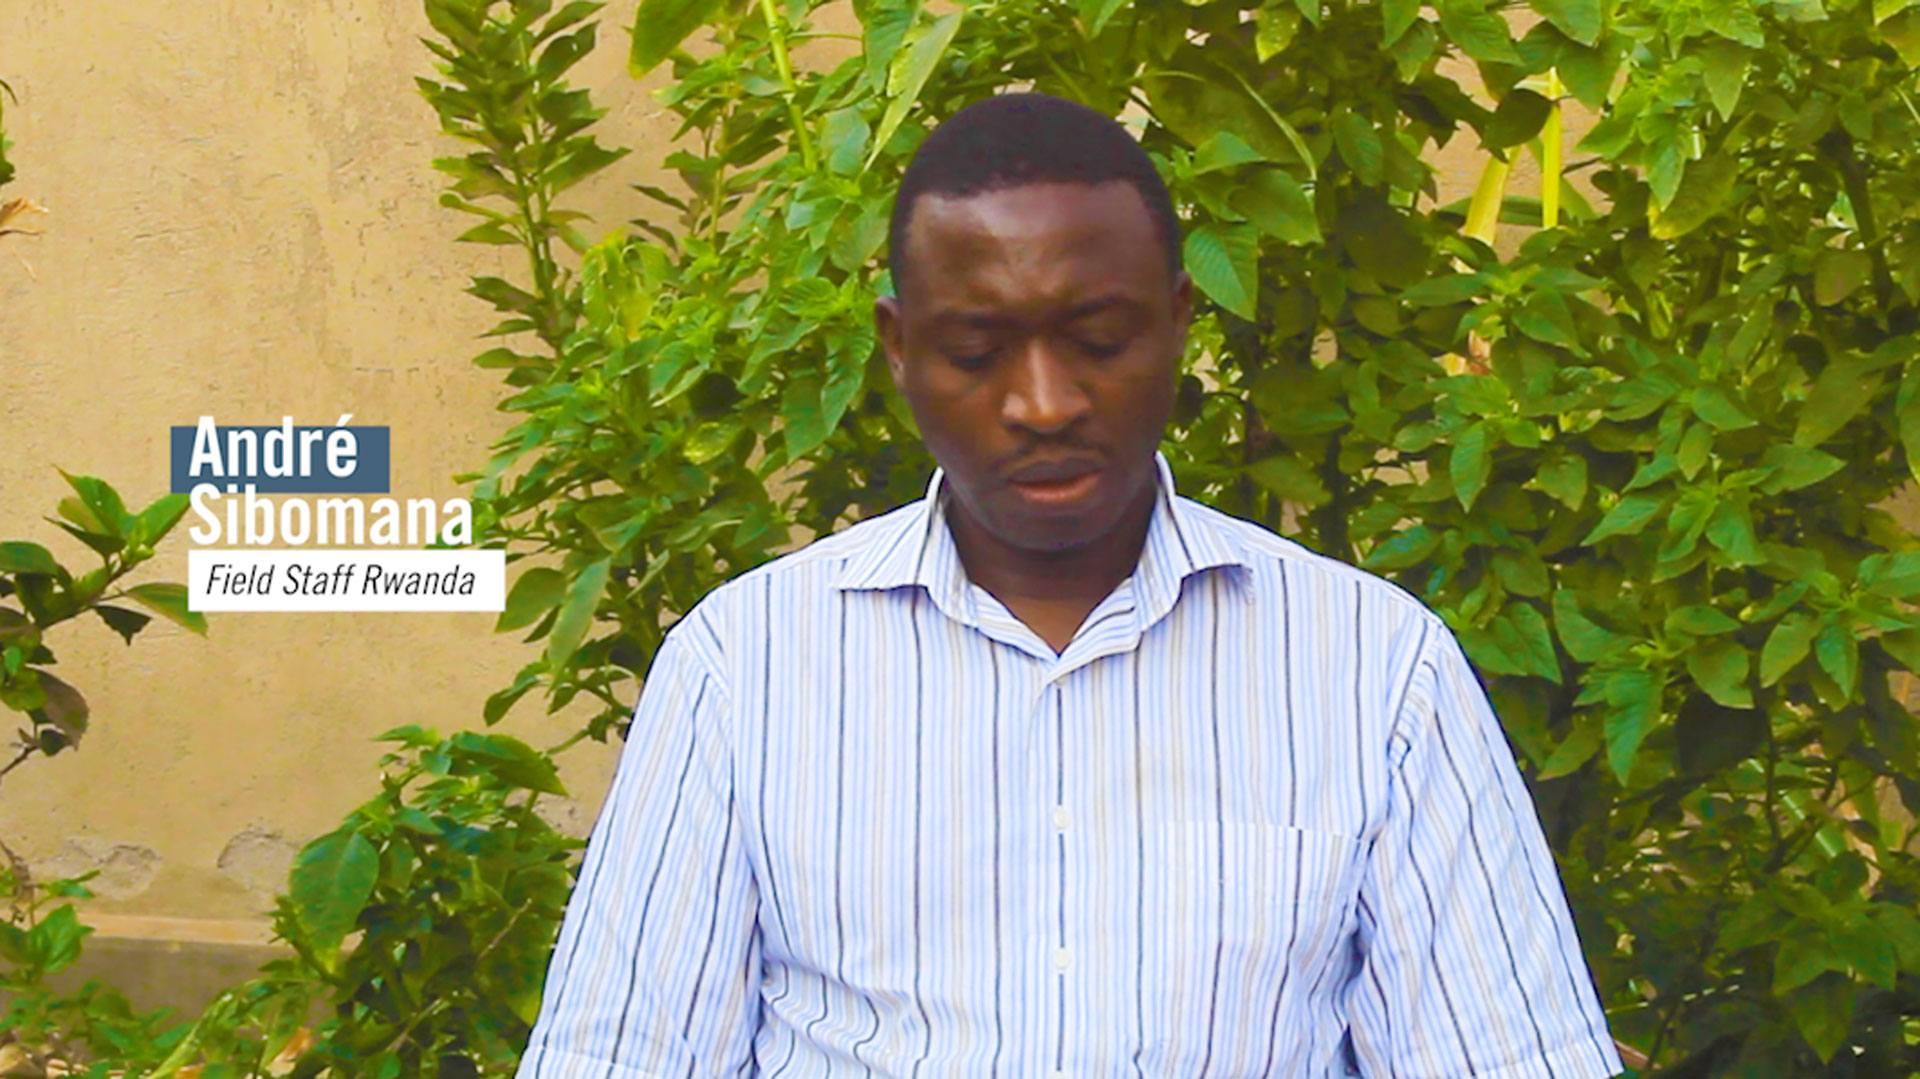 Photo of Andre Sibomana's Prayerline video